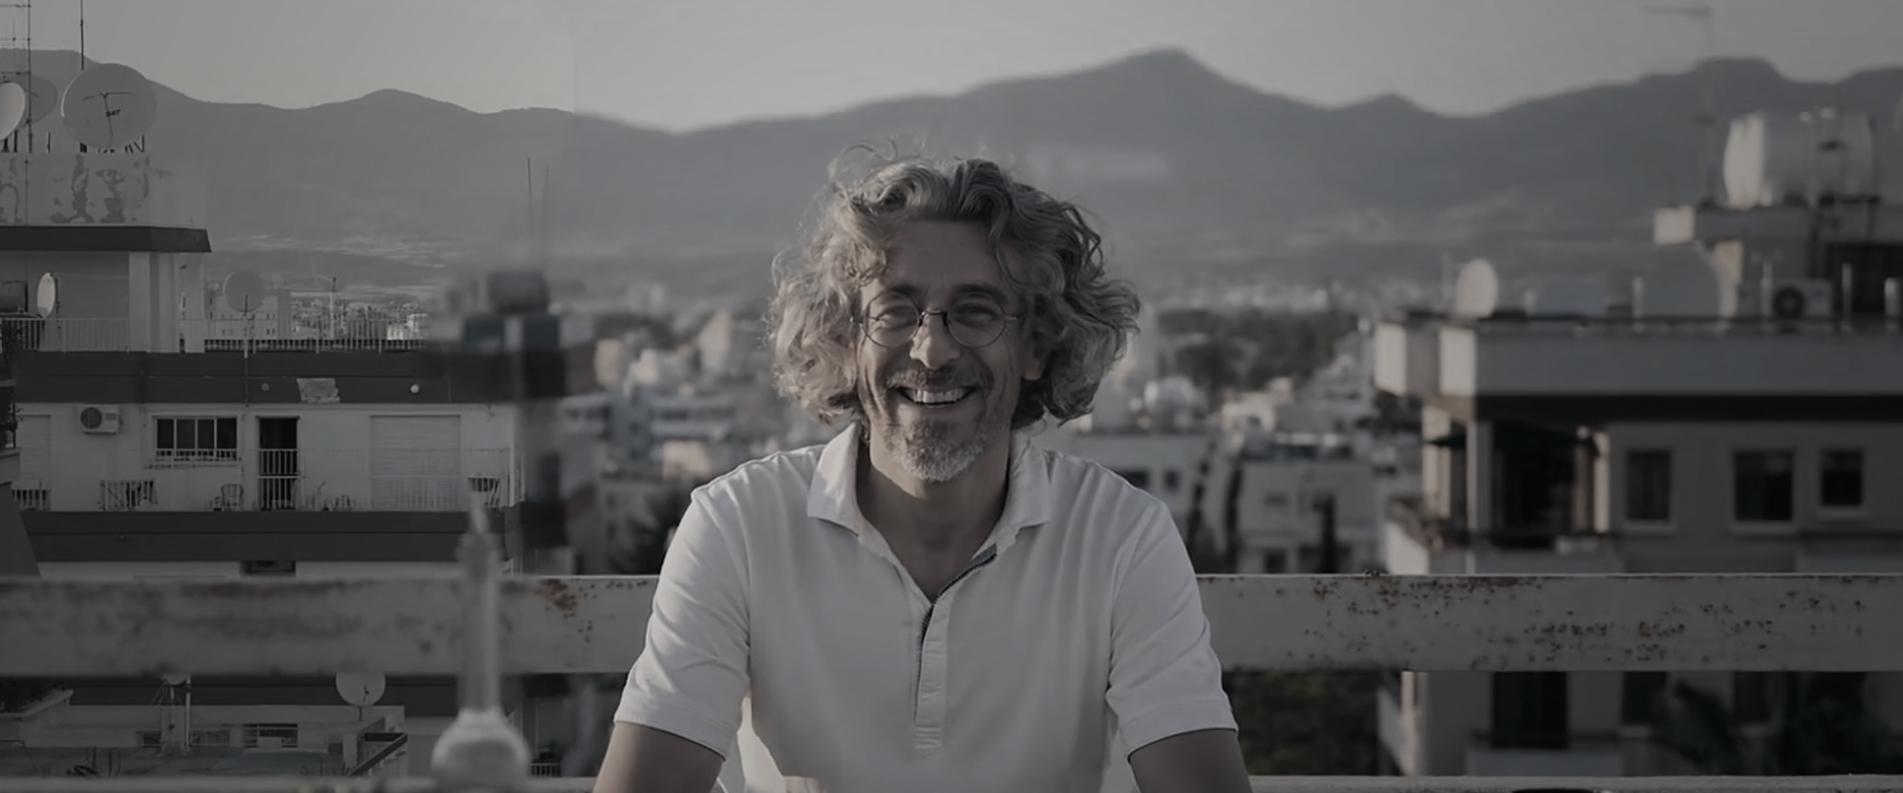 Jean-Philippe Ricau: my three pillars are balance, variety and moderation